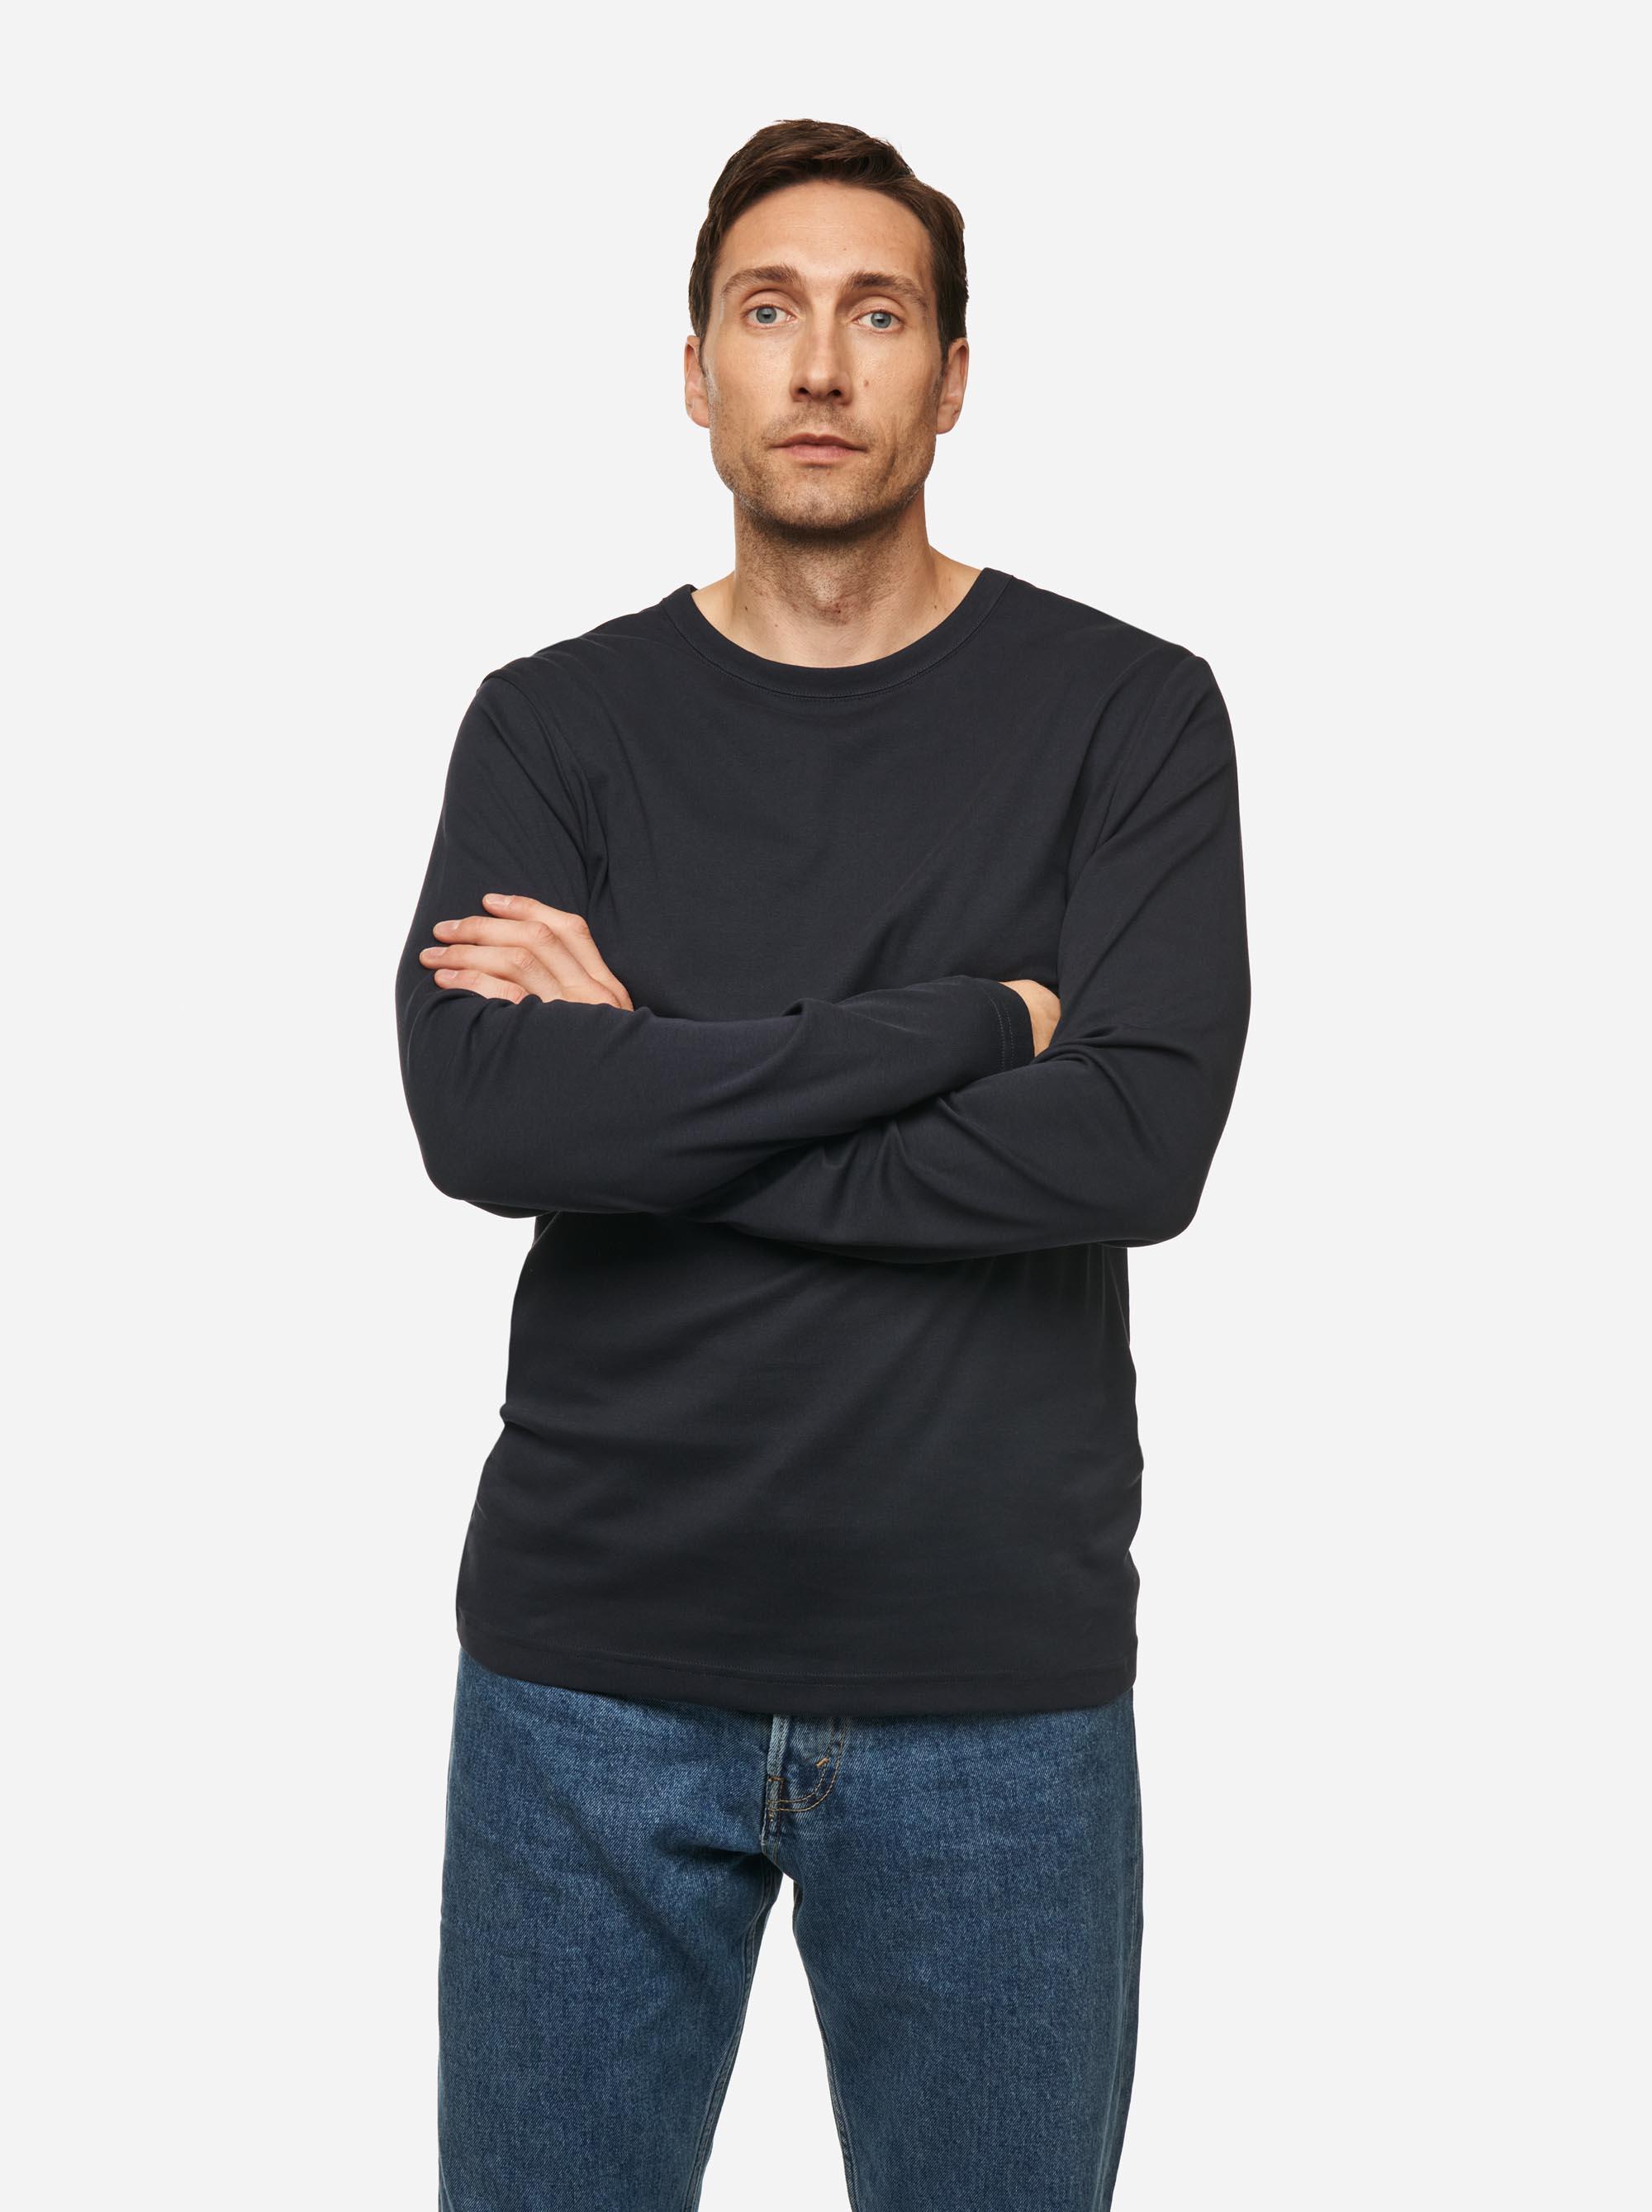 Teym - The-T-Shirt - Longsleeve - Men - Blue - 1